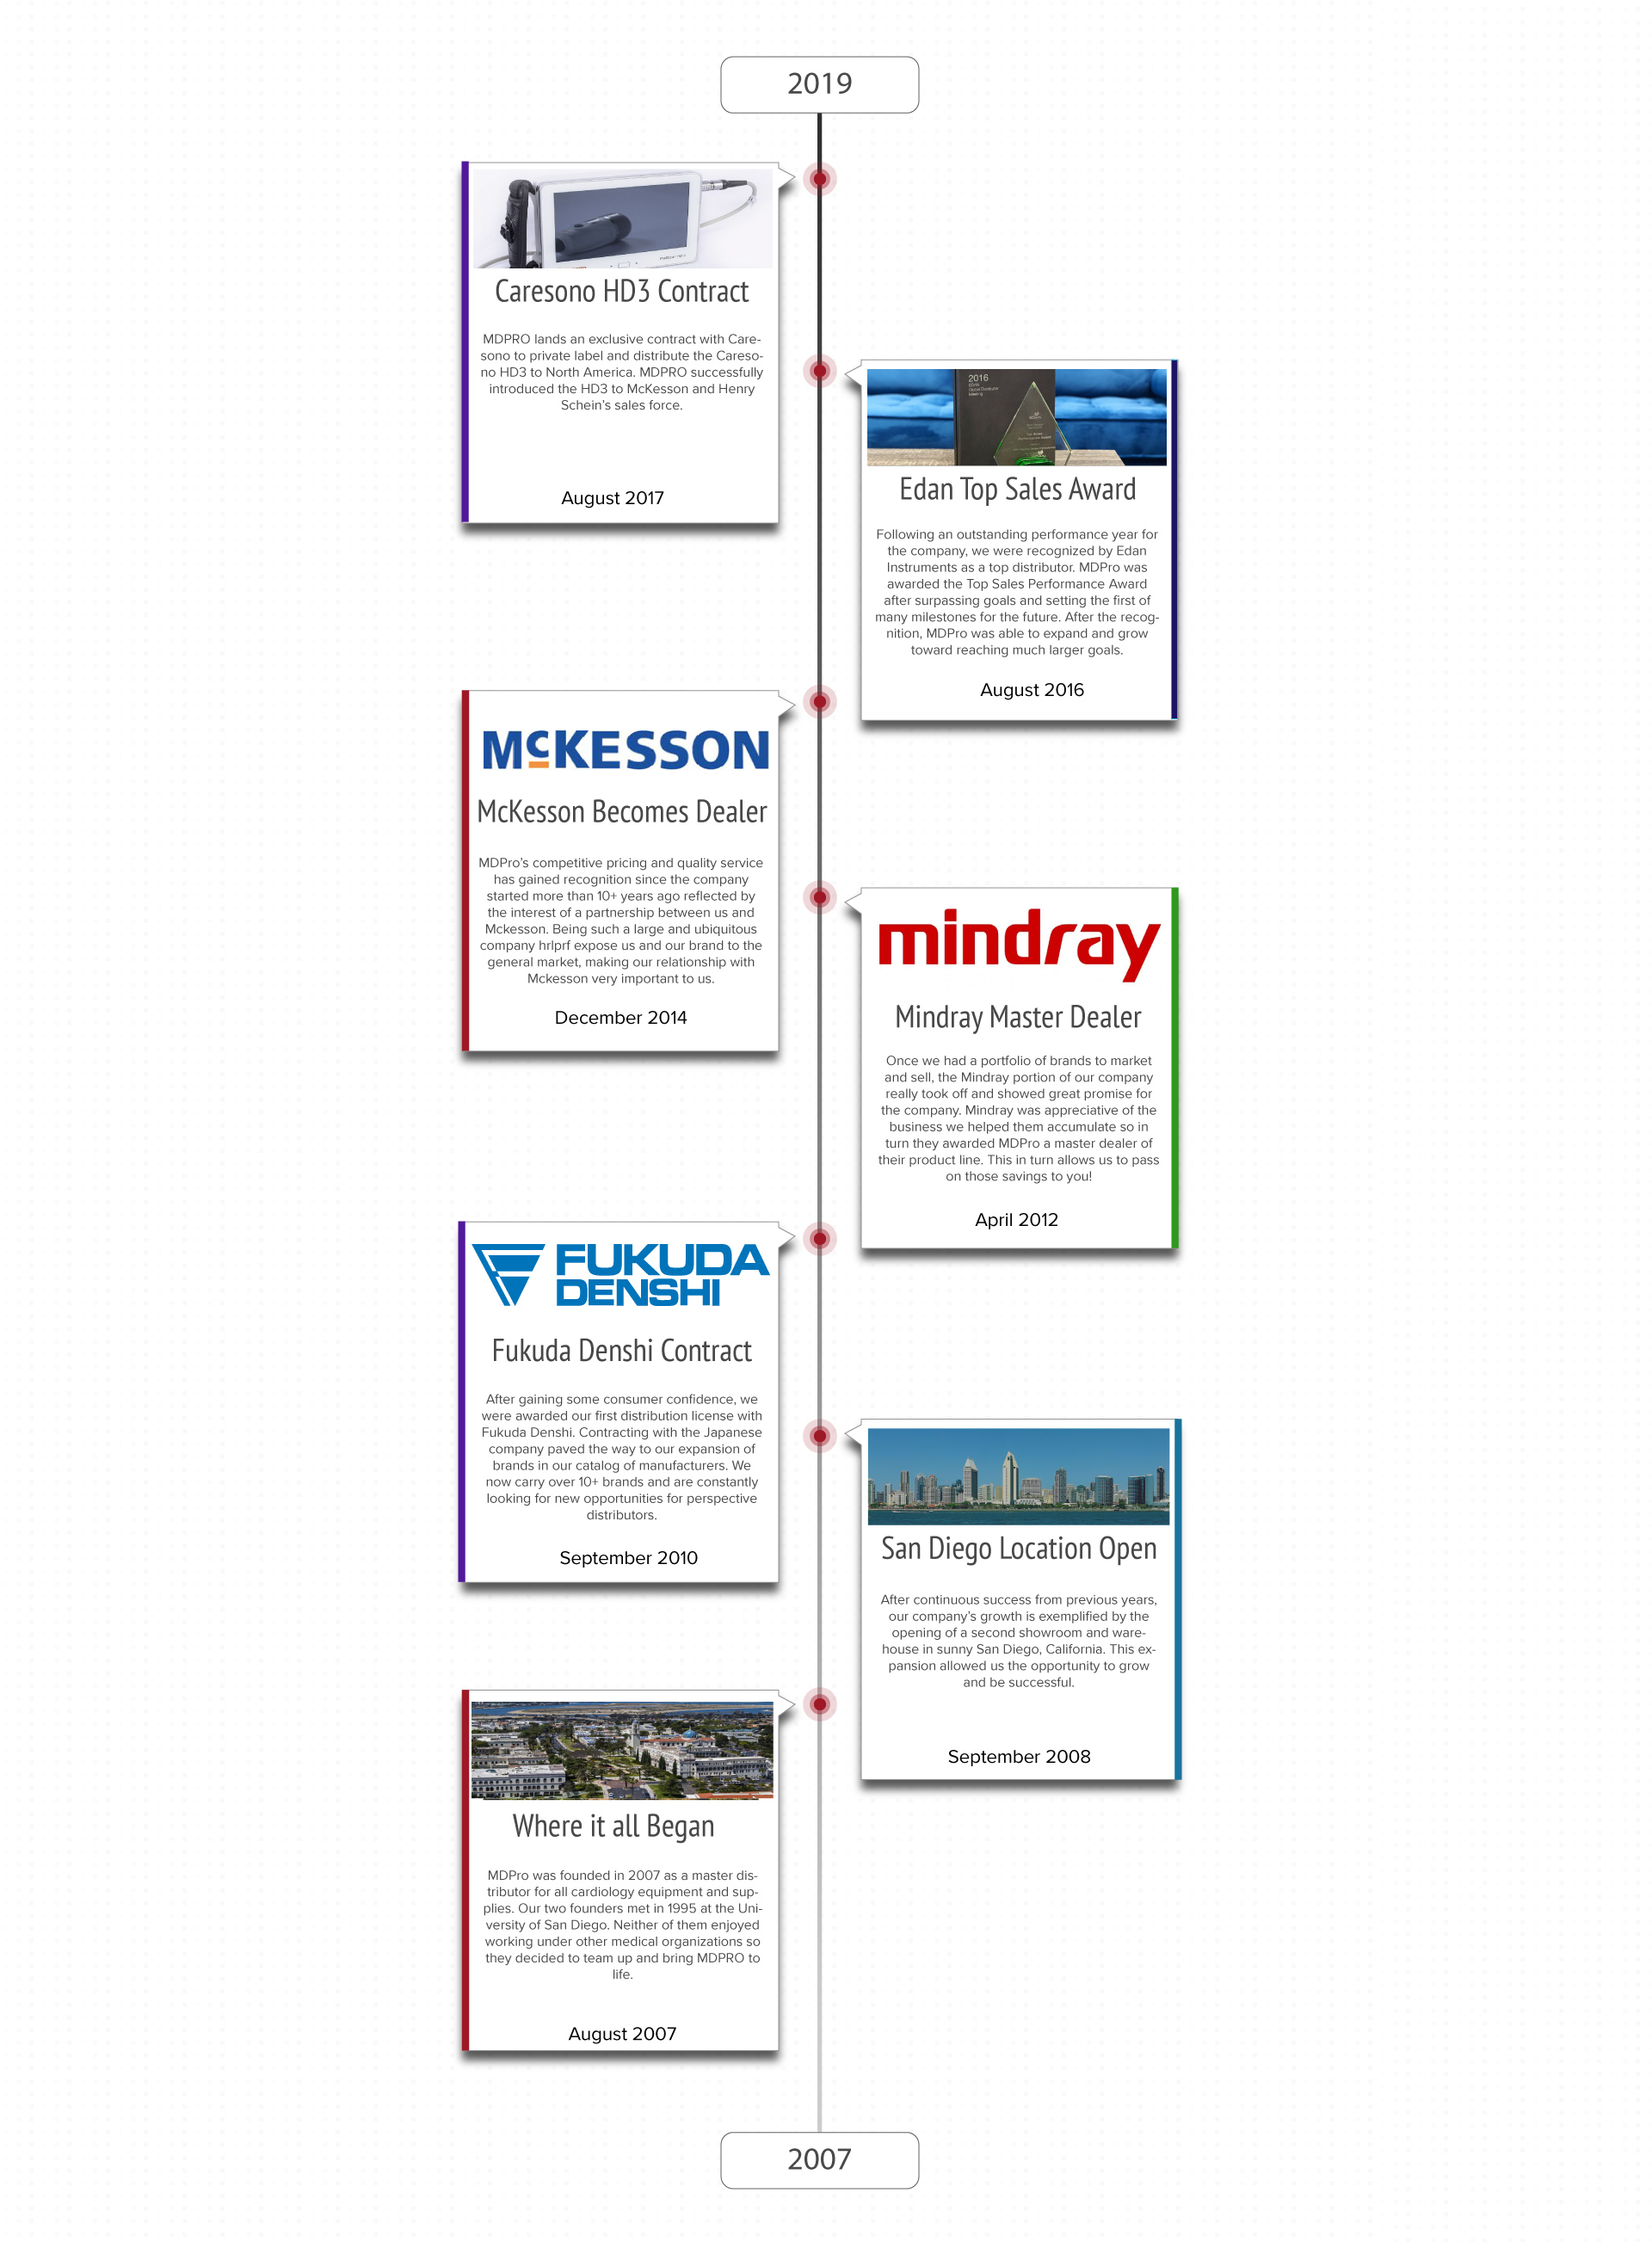 Company-Timeline-EDANV5.0